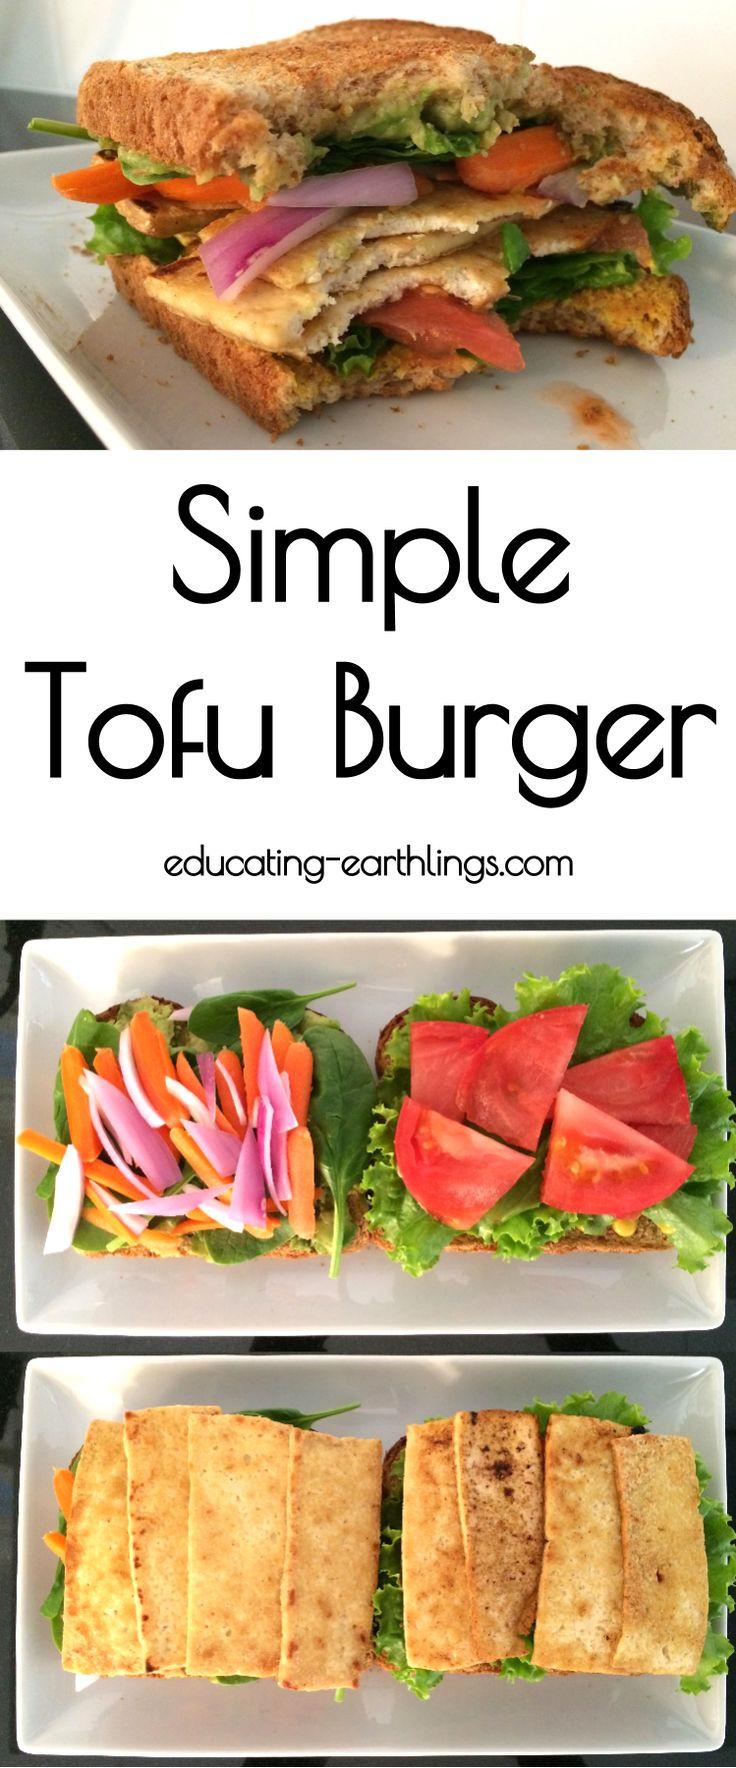 Simple Tofu Burger | Educating Earthlings | vegan burger | vegan lunch | vegan sandwich | plant based lunch | plant based burger | plant based sandwich | plant based protein | vegan protein